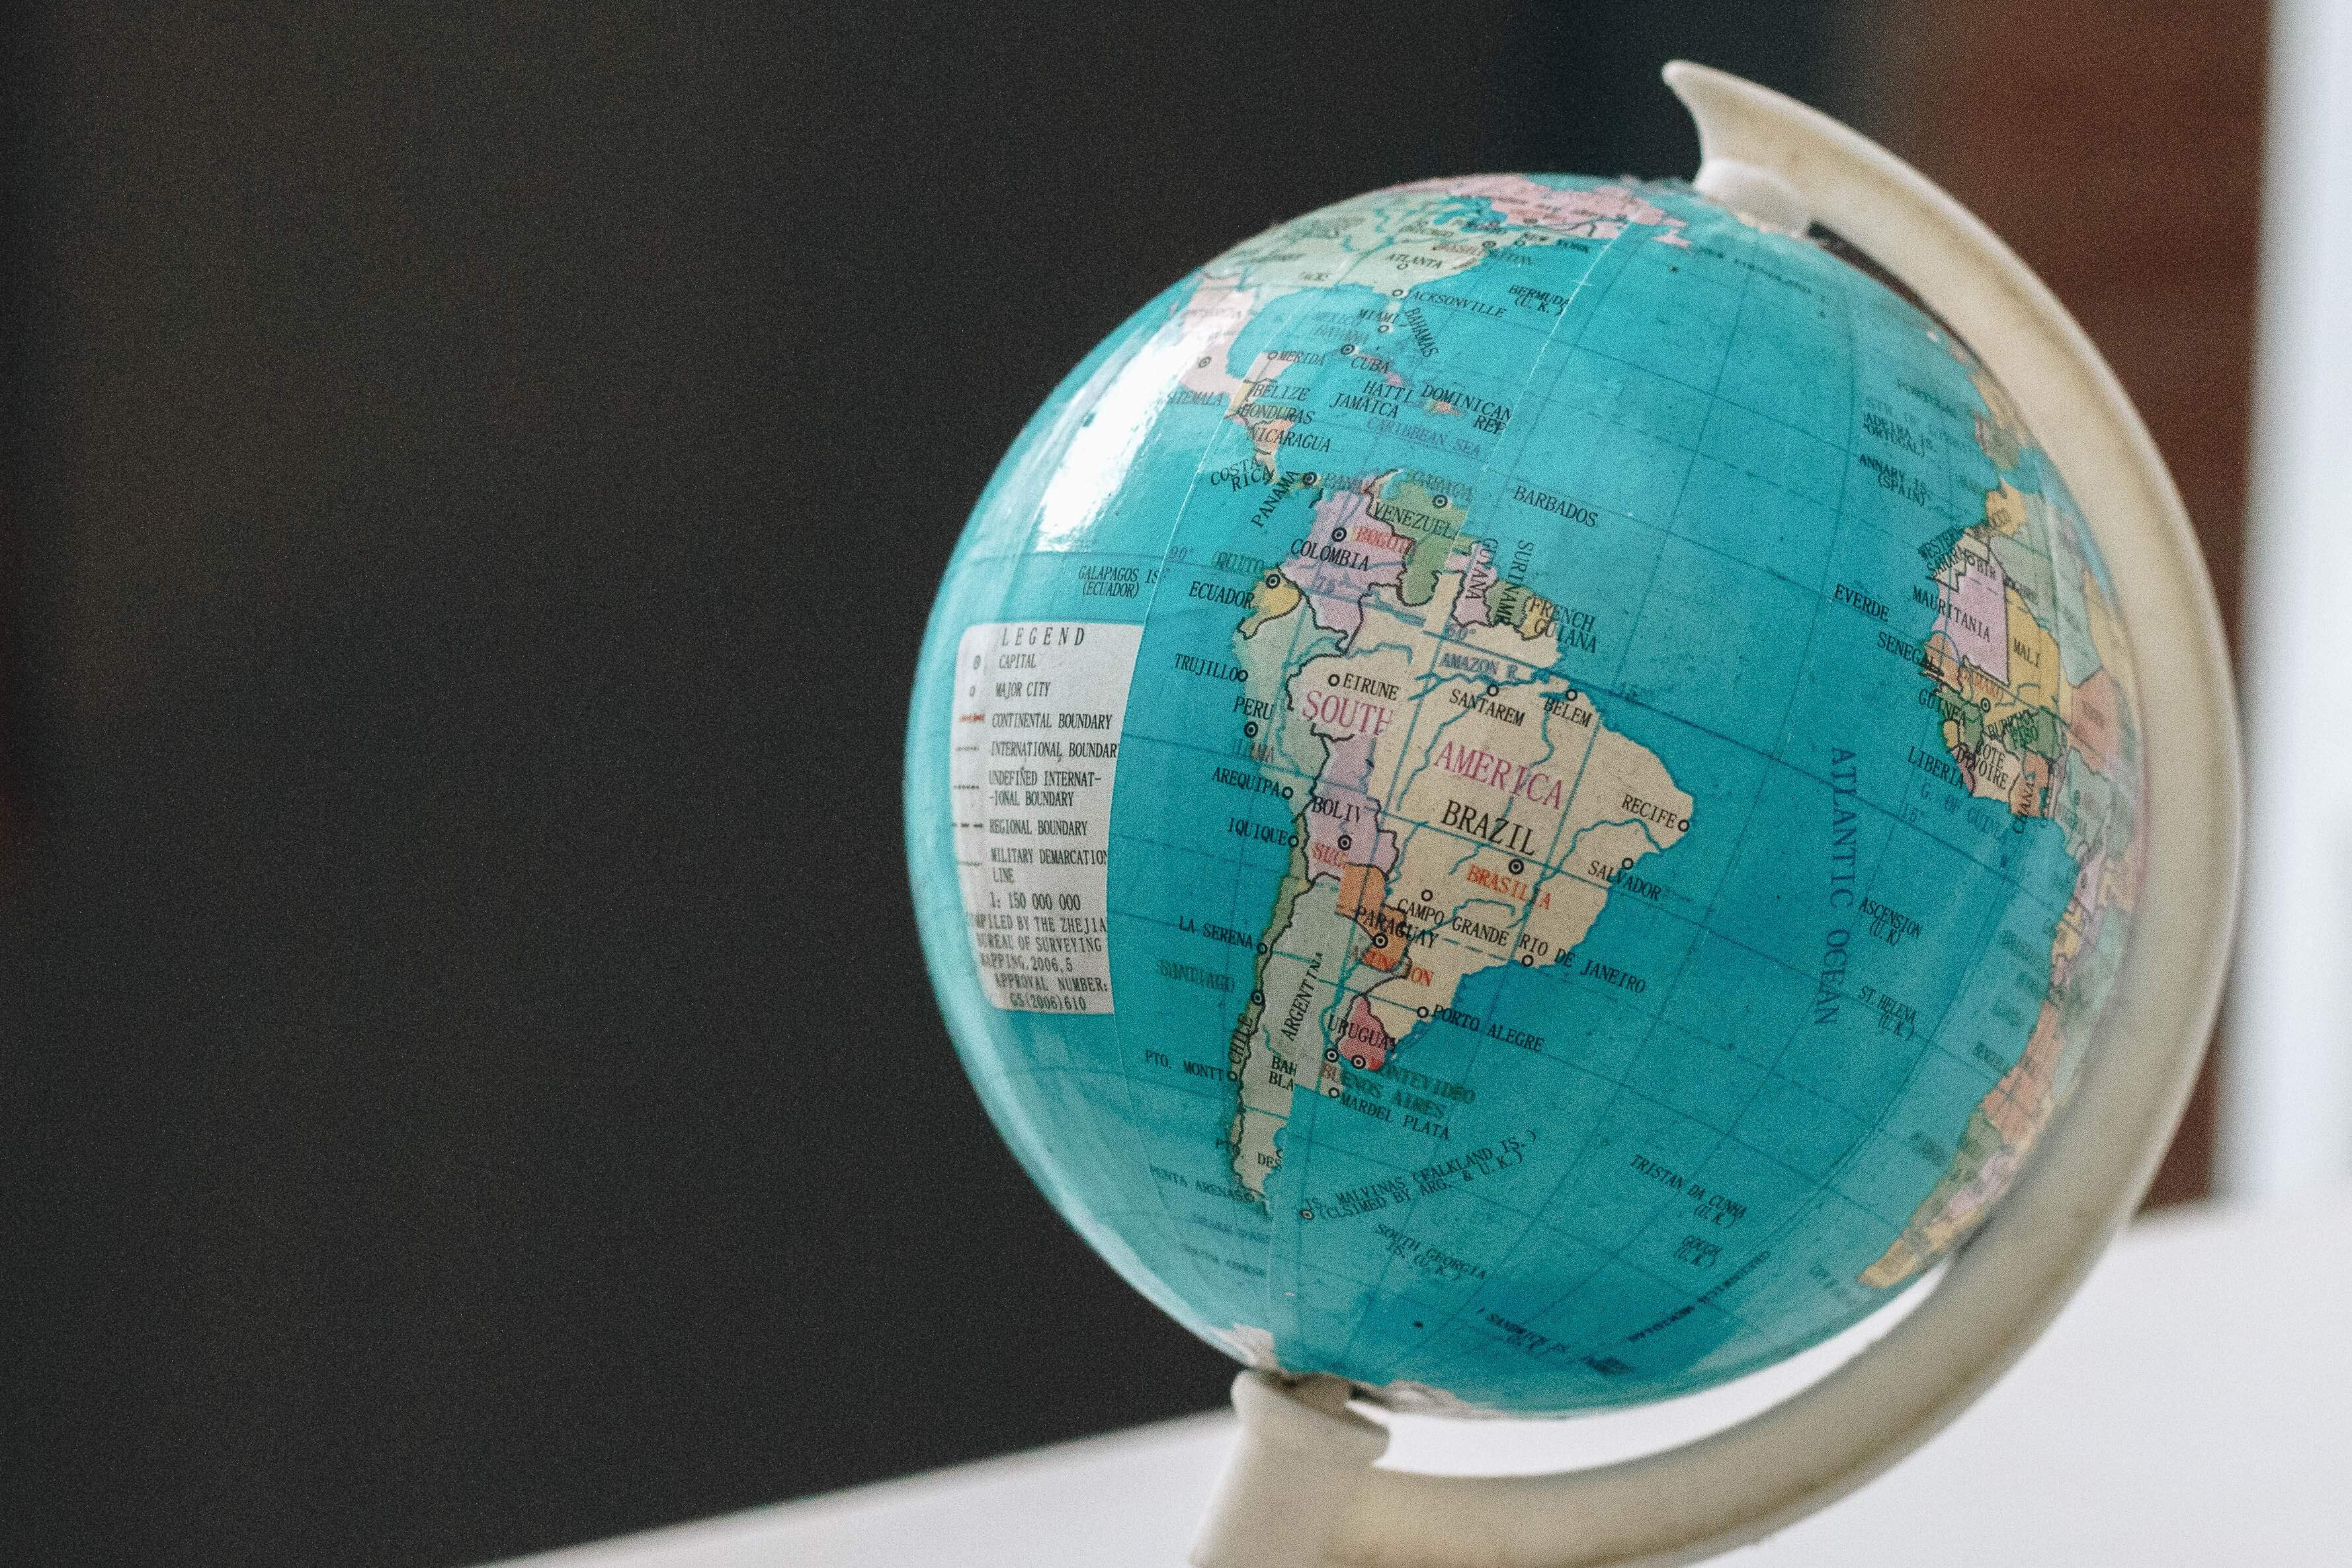 Tours gratuitos en Latinoamérica - Bichito Viajero